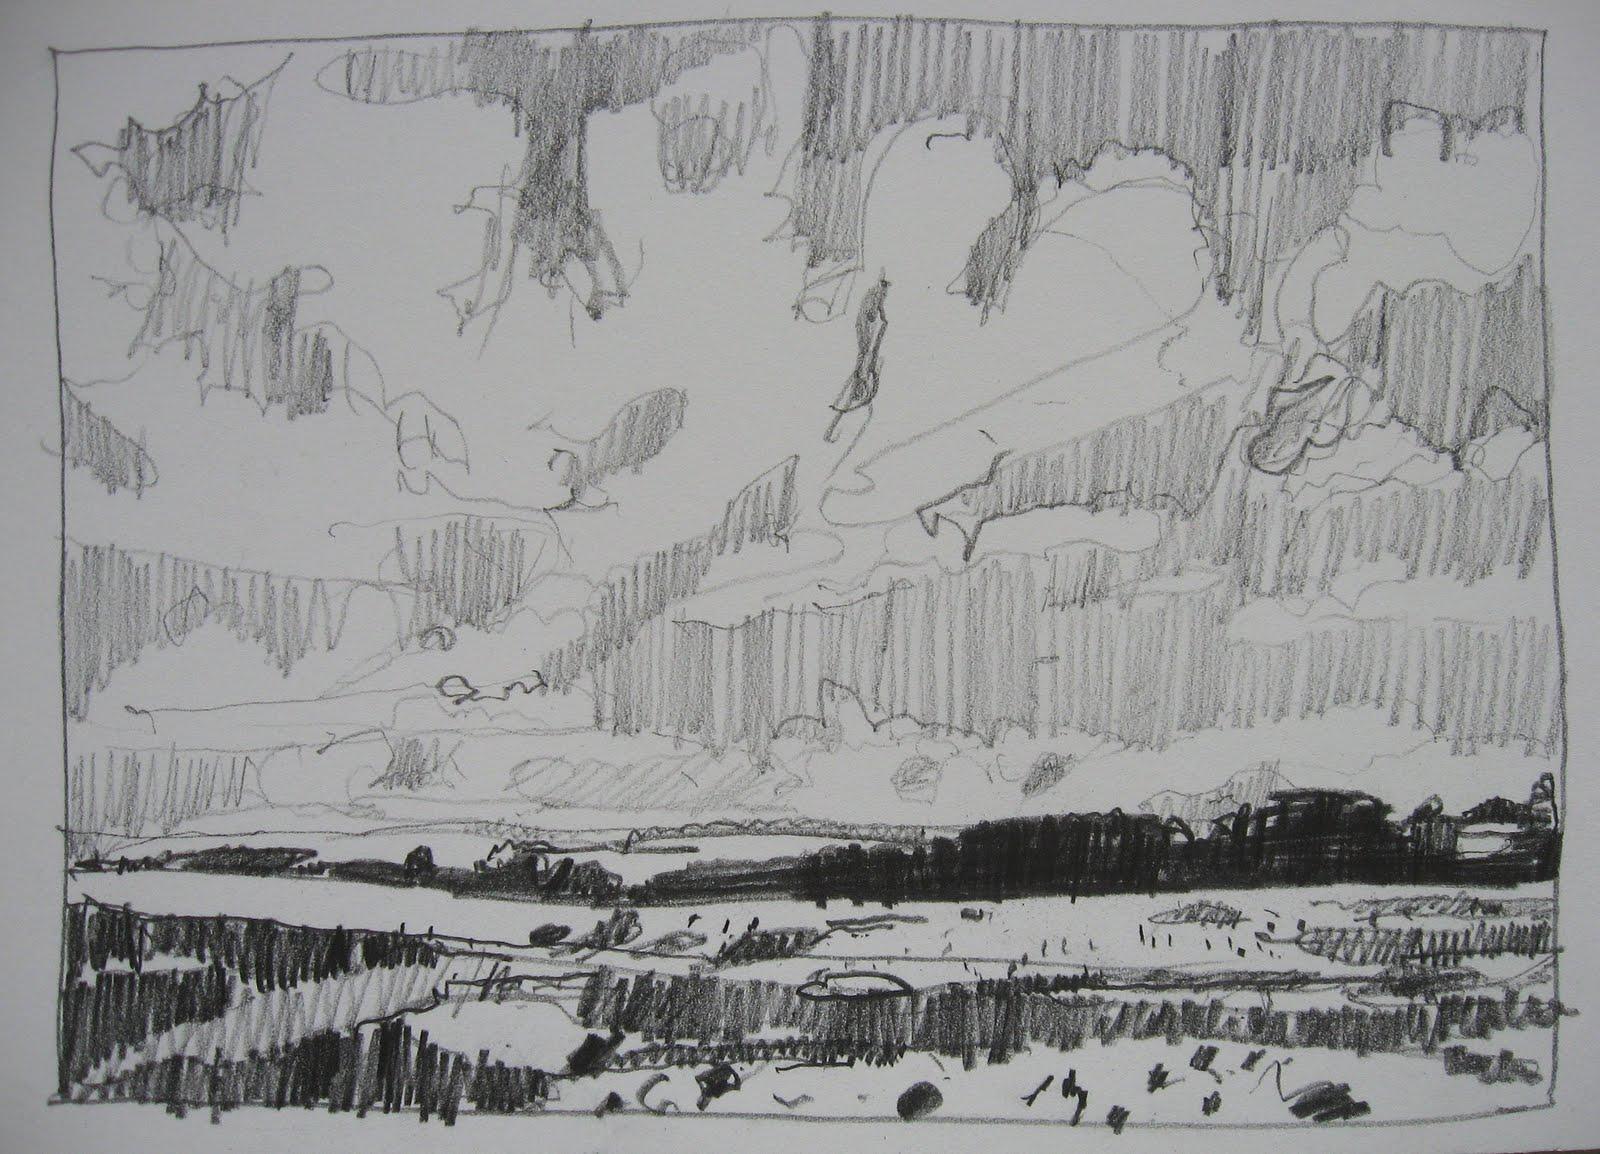 Landscape PaintingsHarry Stooshinoff Pencil Drawings